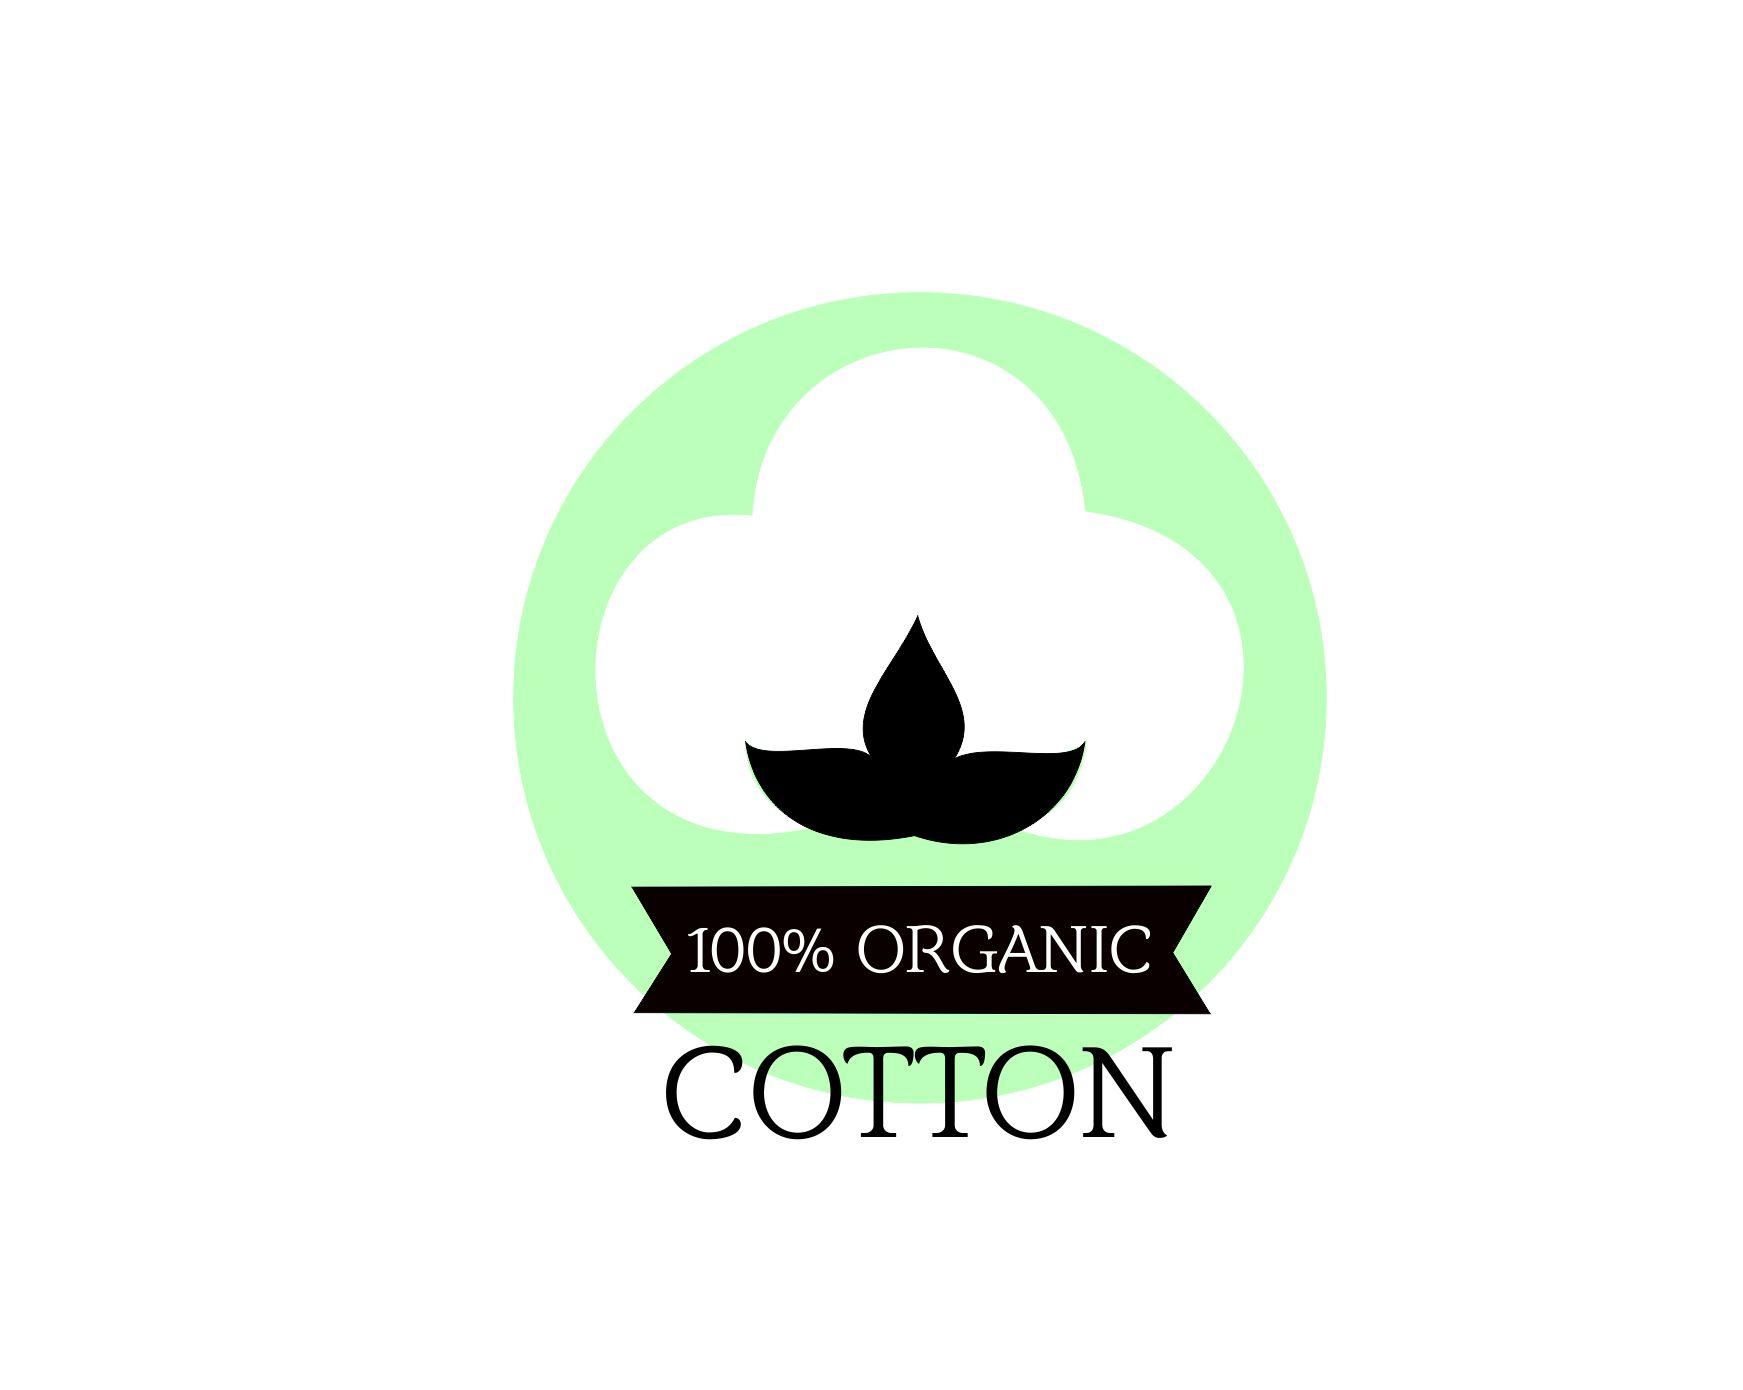 organic11.jpg